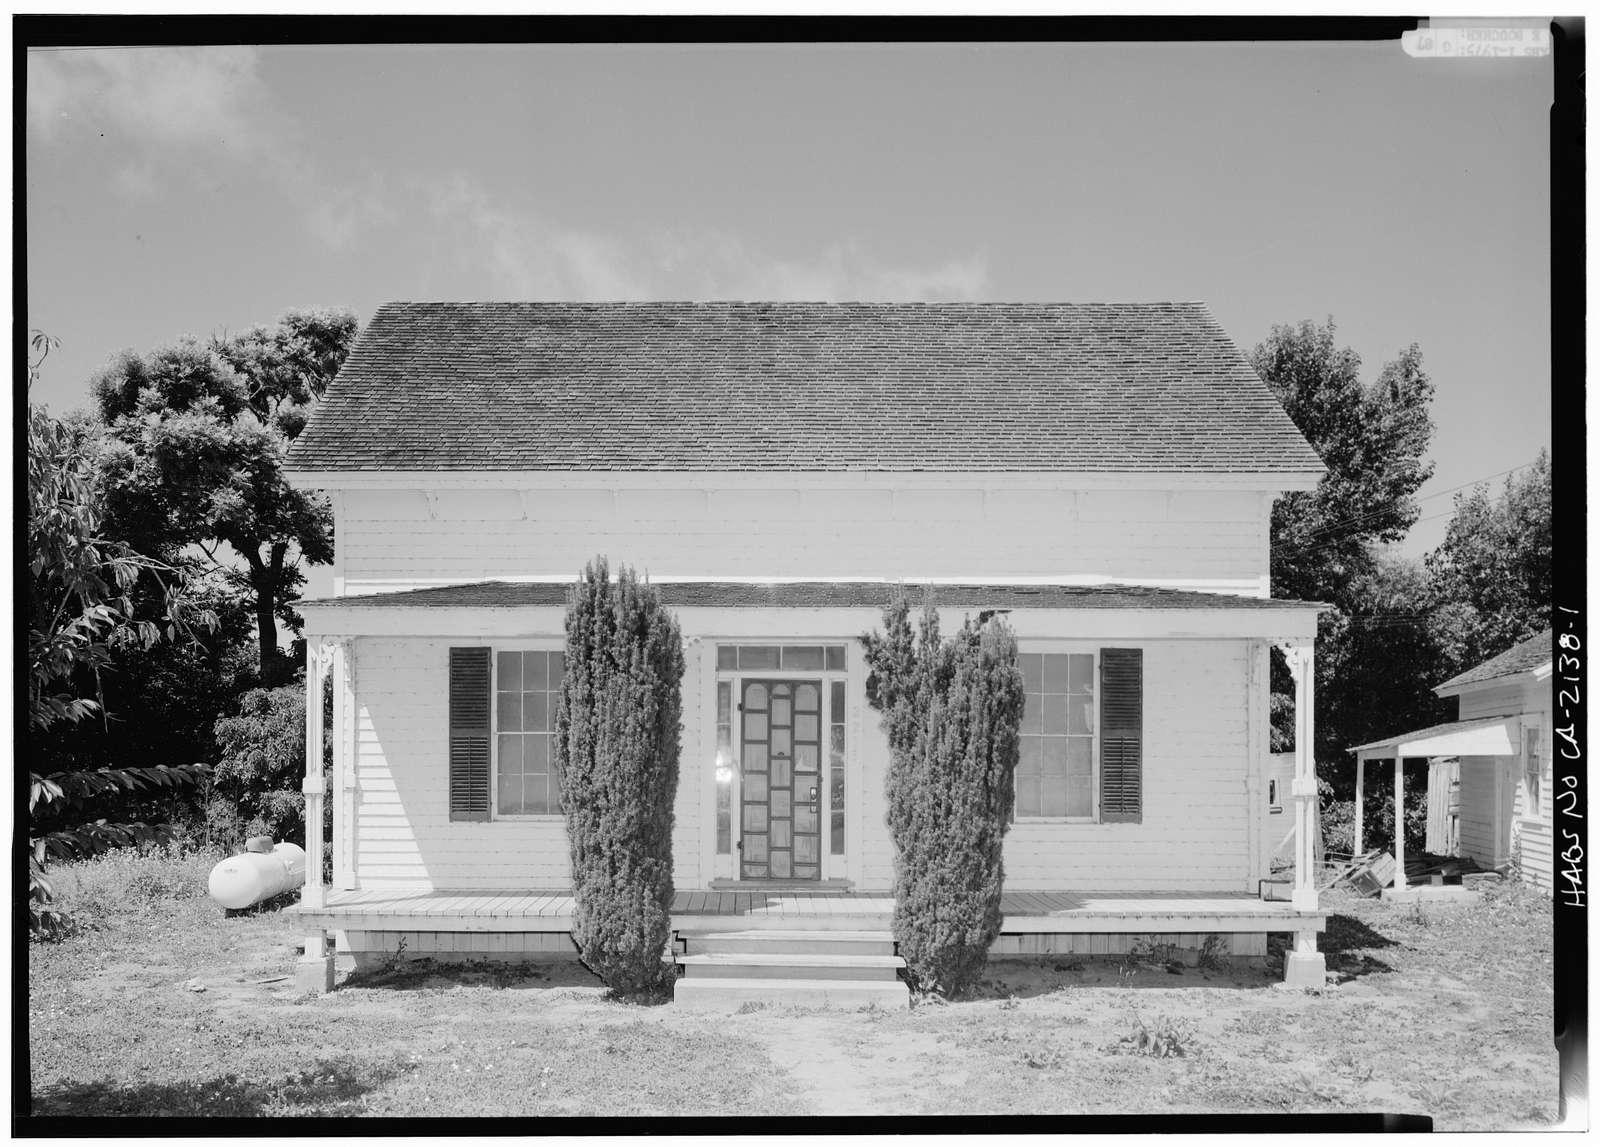 Braddock Weeks House, Pescadero Road, Pescadero, San Mateo County, CA